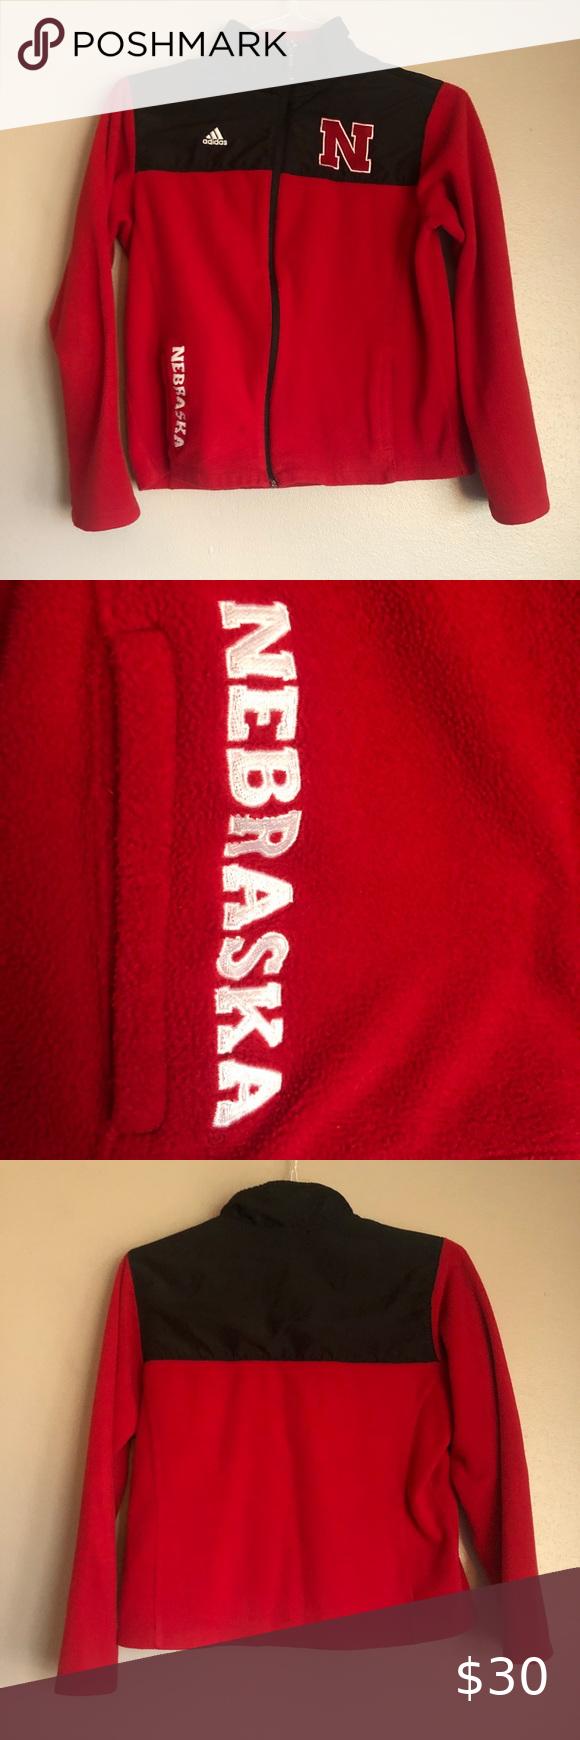 Adidas Nebraska Huskers Full Zip Fleece Jacket Fleece Jacket Jackets Red Adidas [ 1740 x 580 Pixel ]